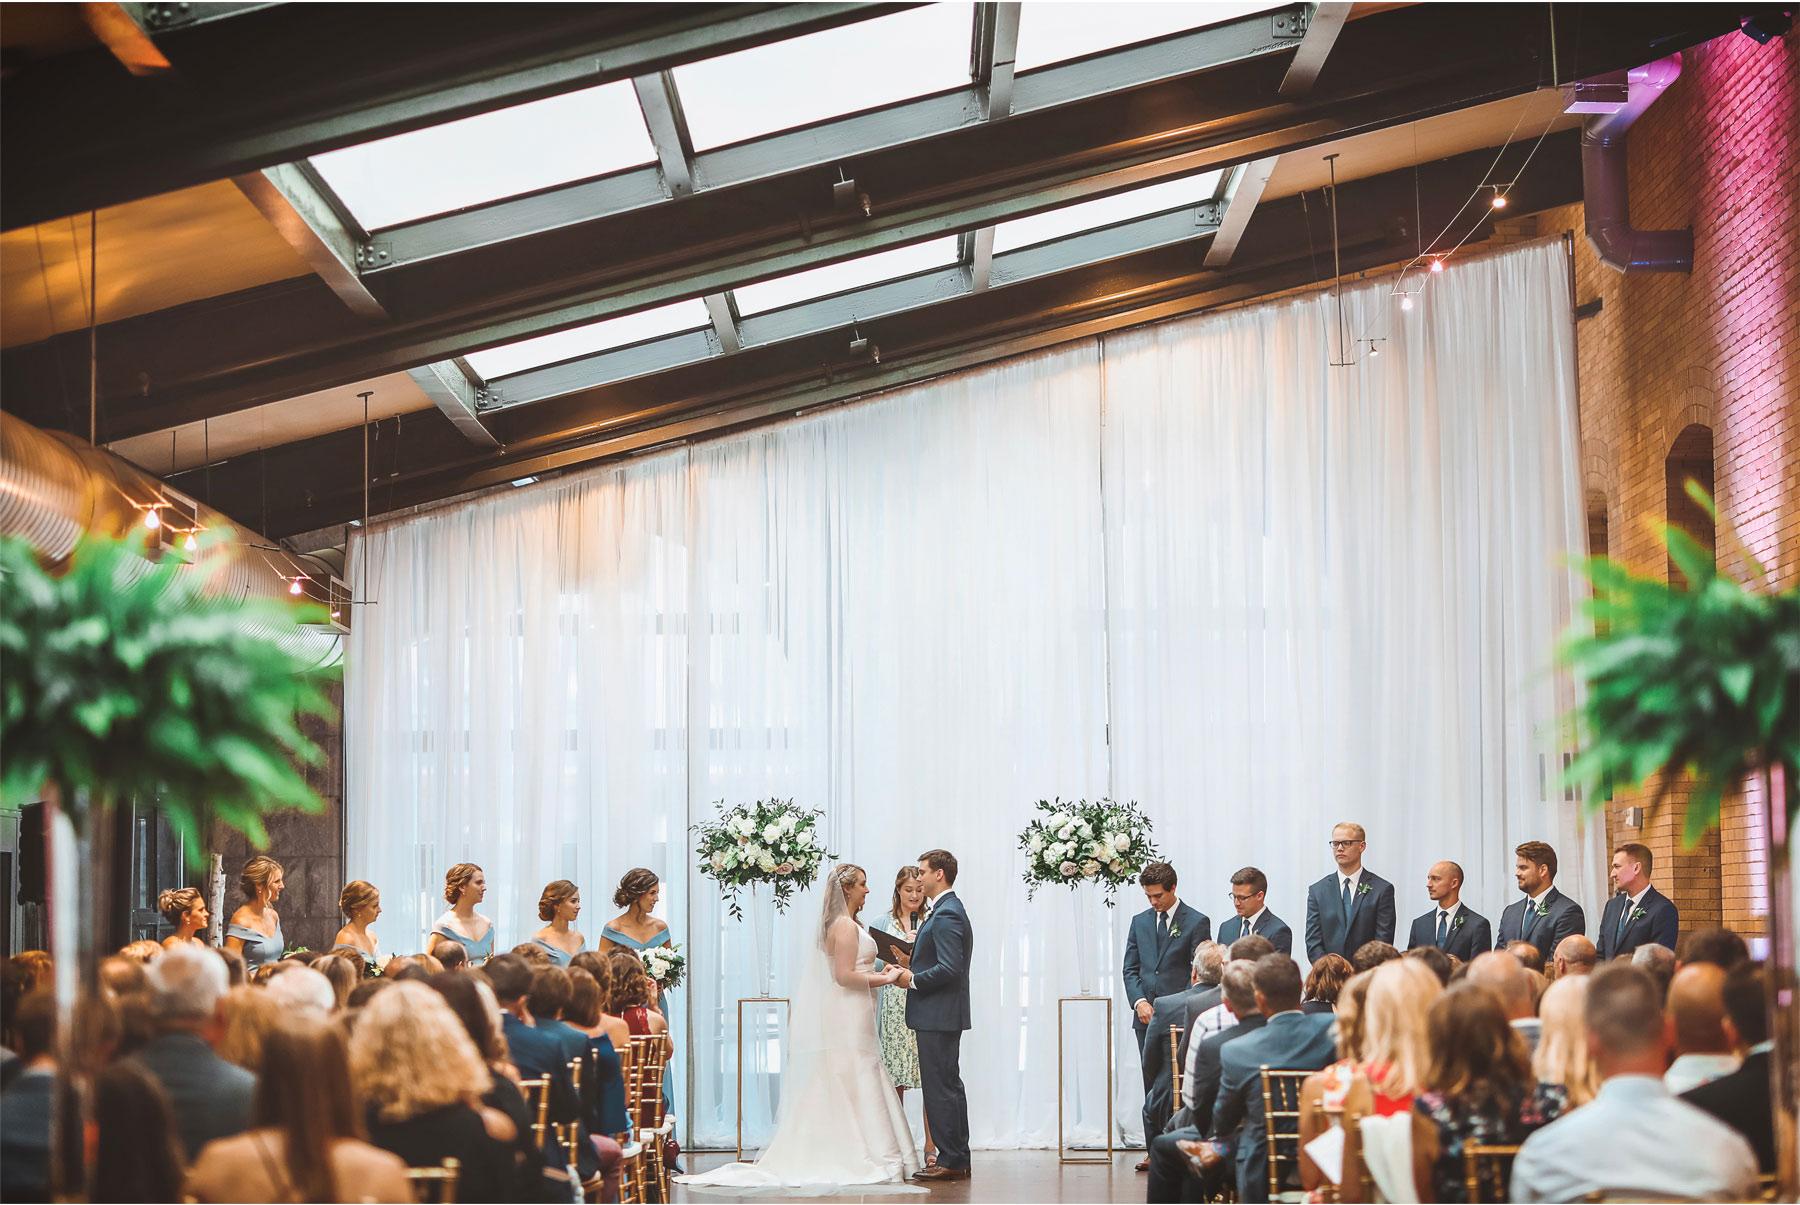 16-Minneapolis-Minnesota-Wedding-Vick-Photography-The-Depot-Ceremony-Amelia-and-Alexander.jpg